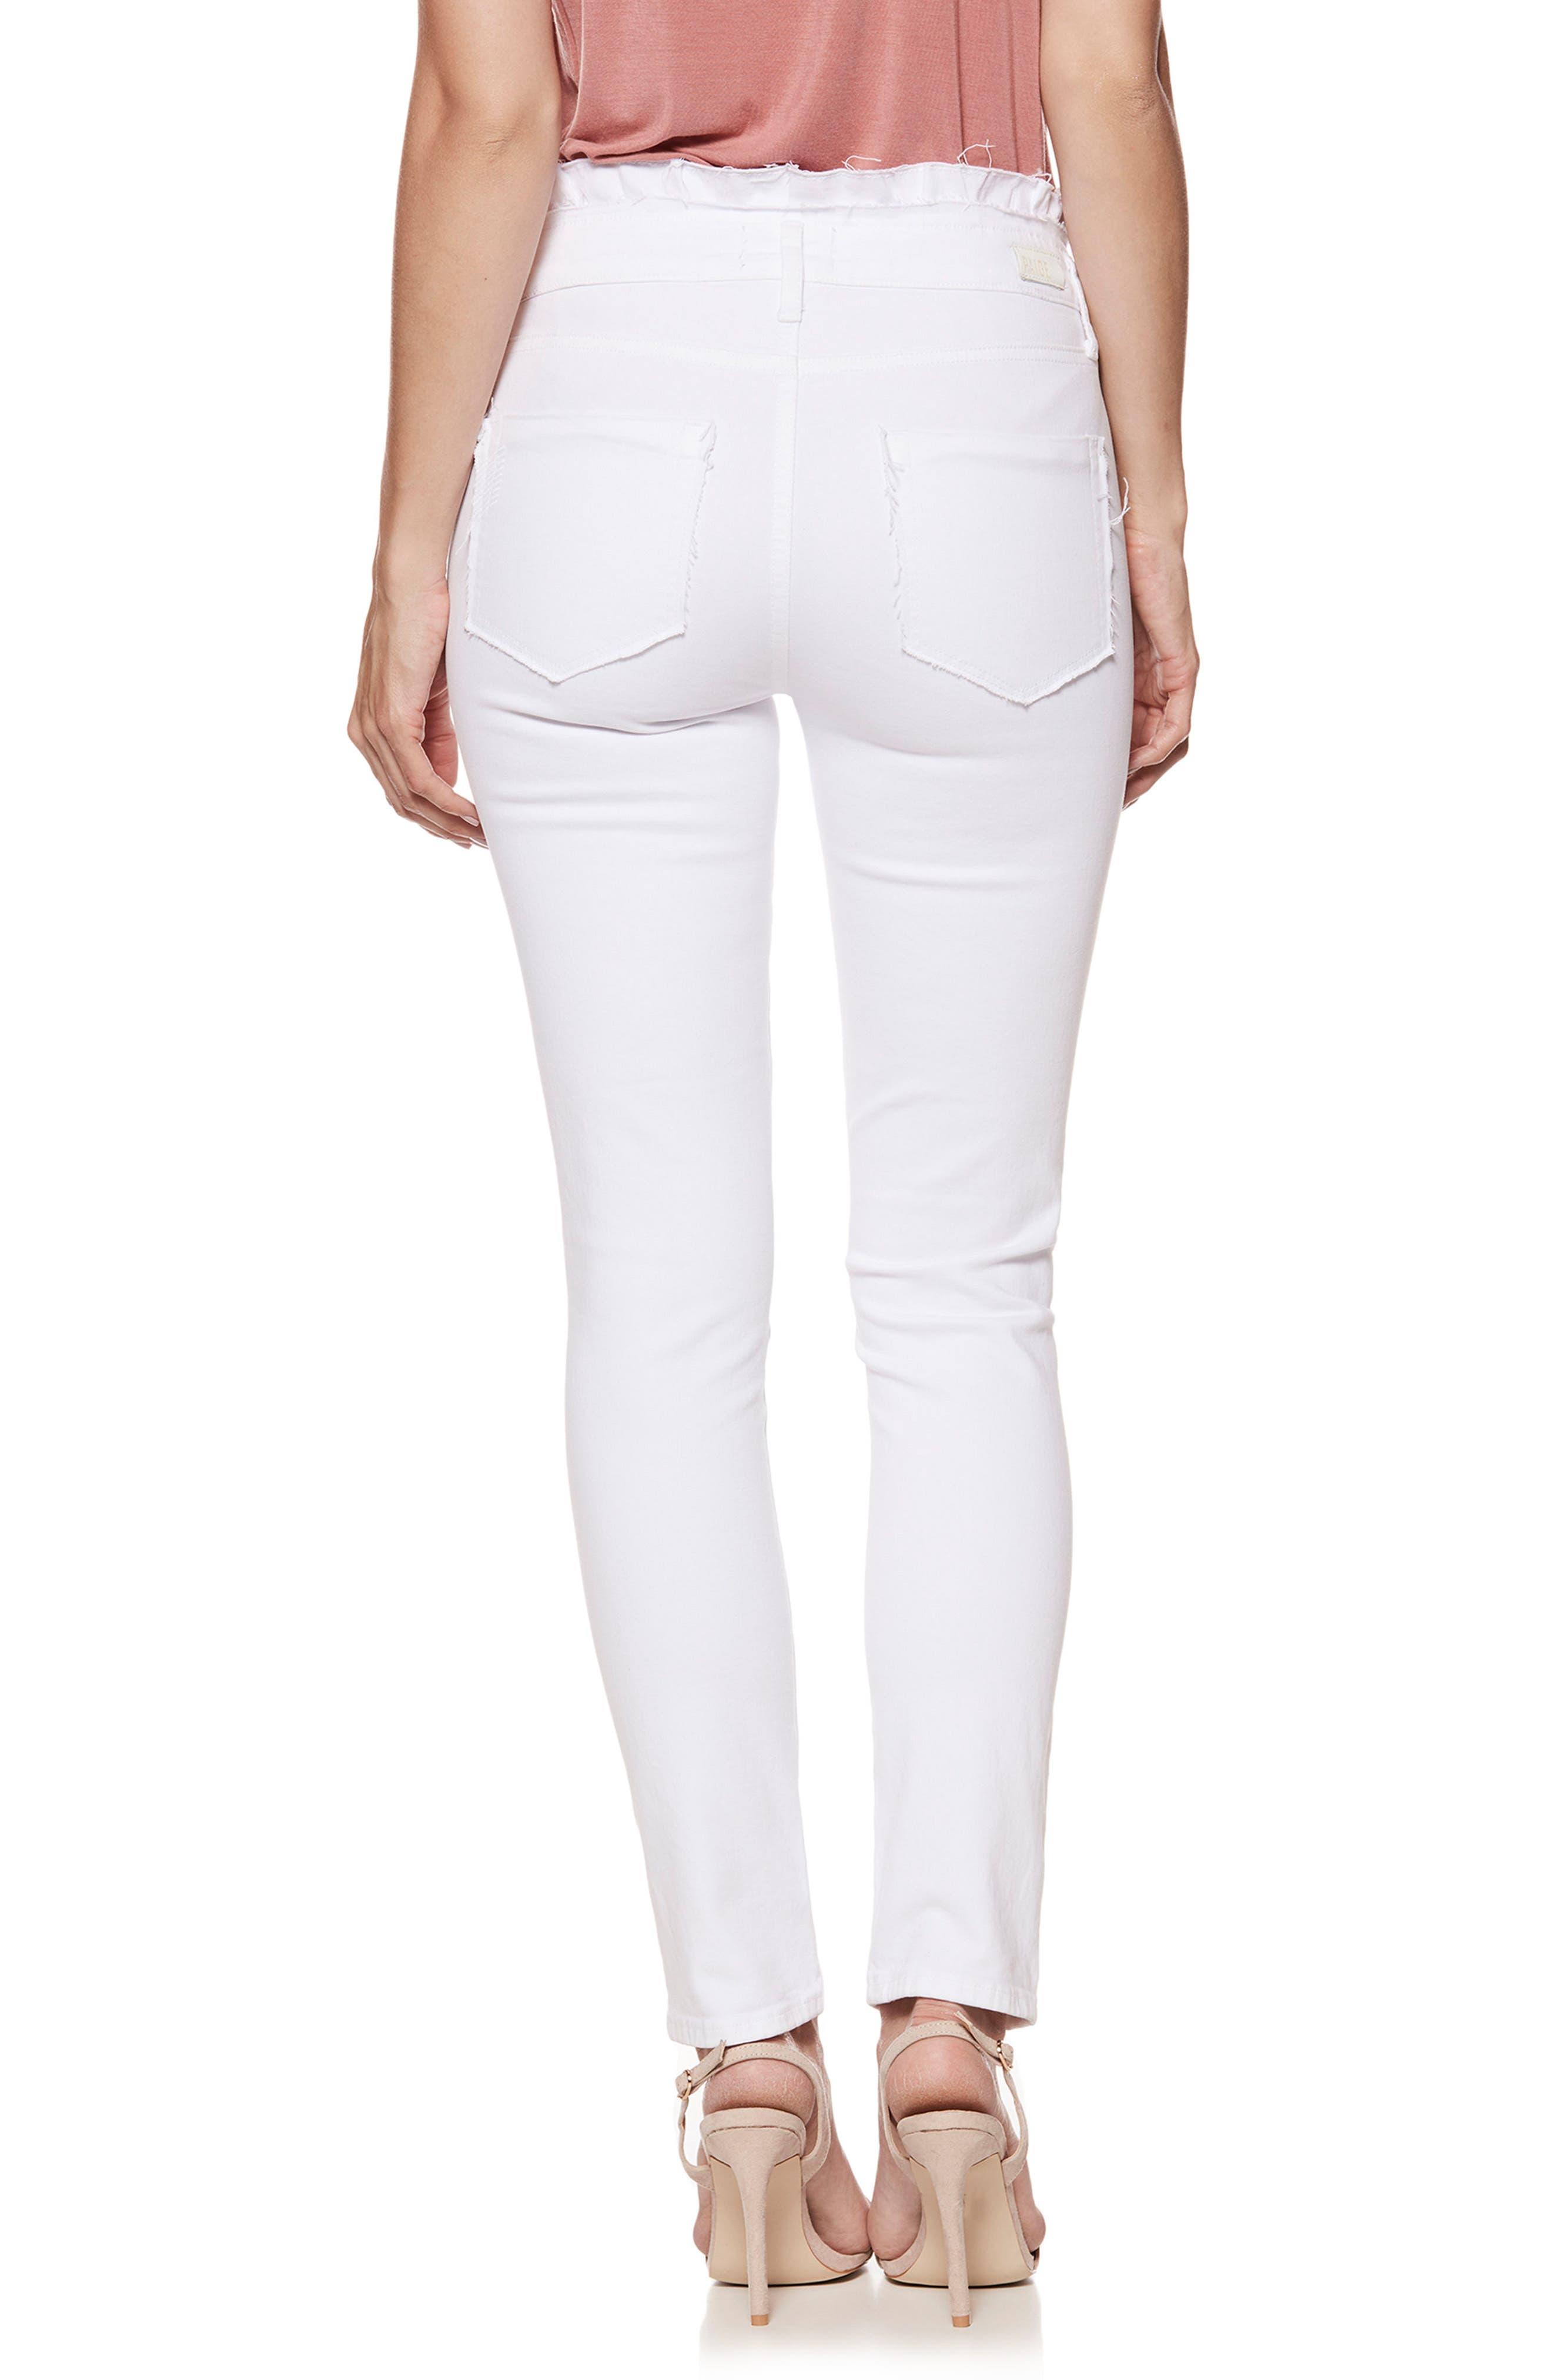 Hoxton Ruffle High Waist Ankle Ultra Skinny Jeans,                             Alternate thumbnail 3, color,                             Crisp White